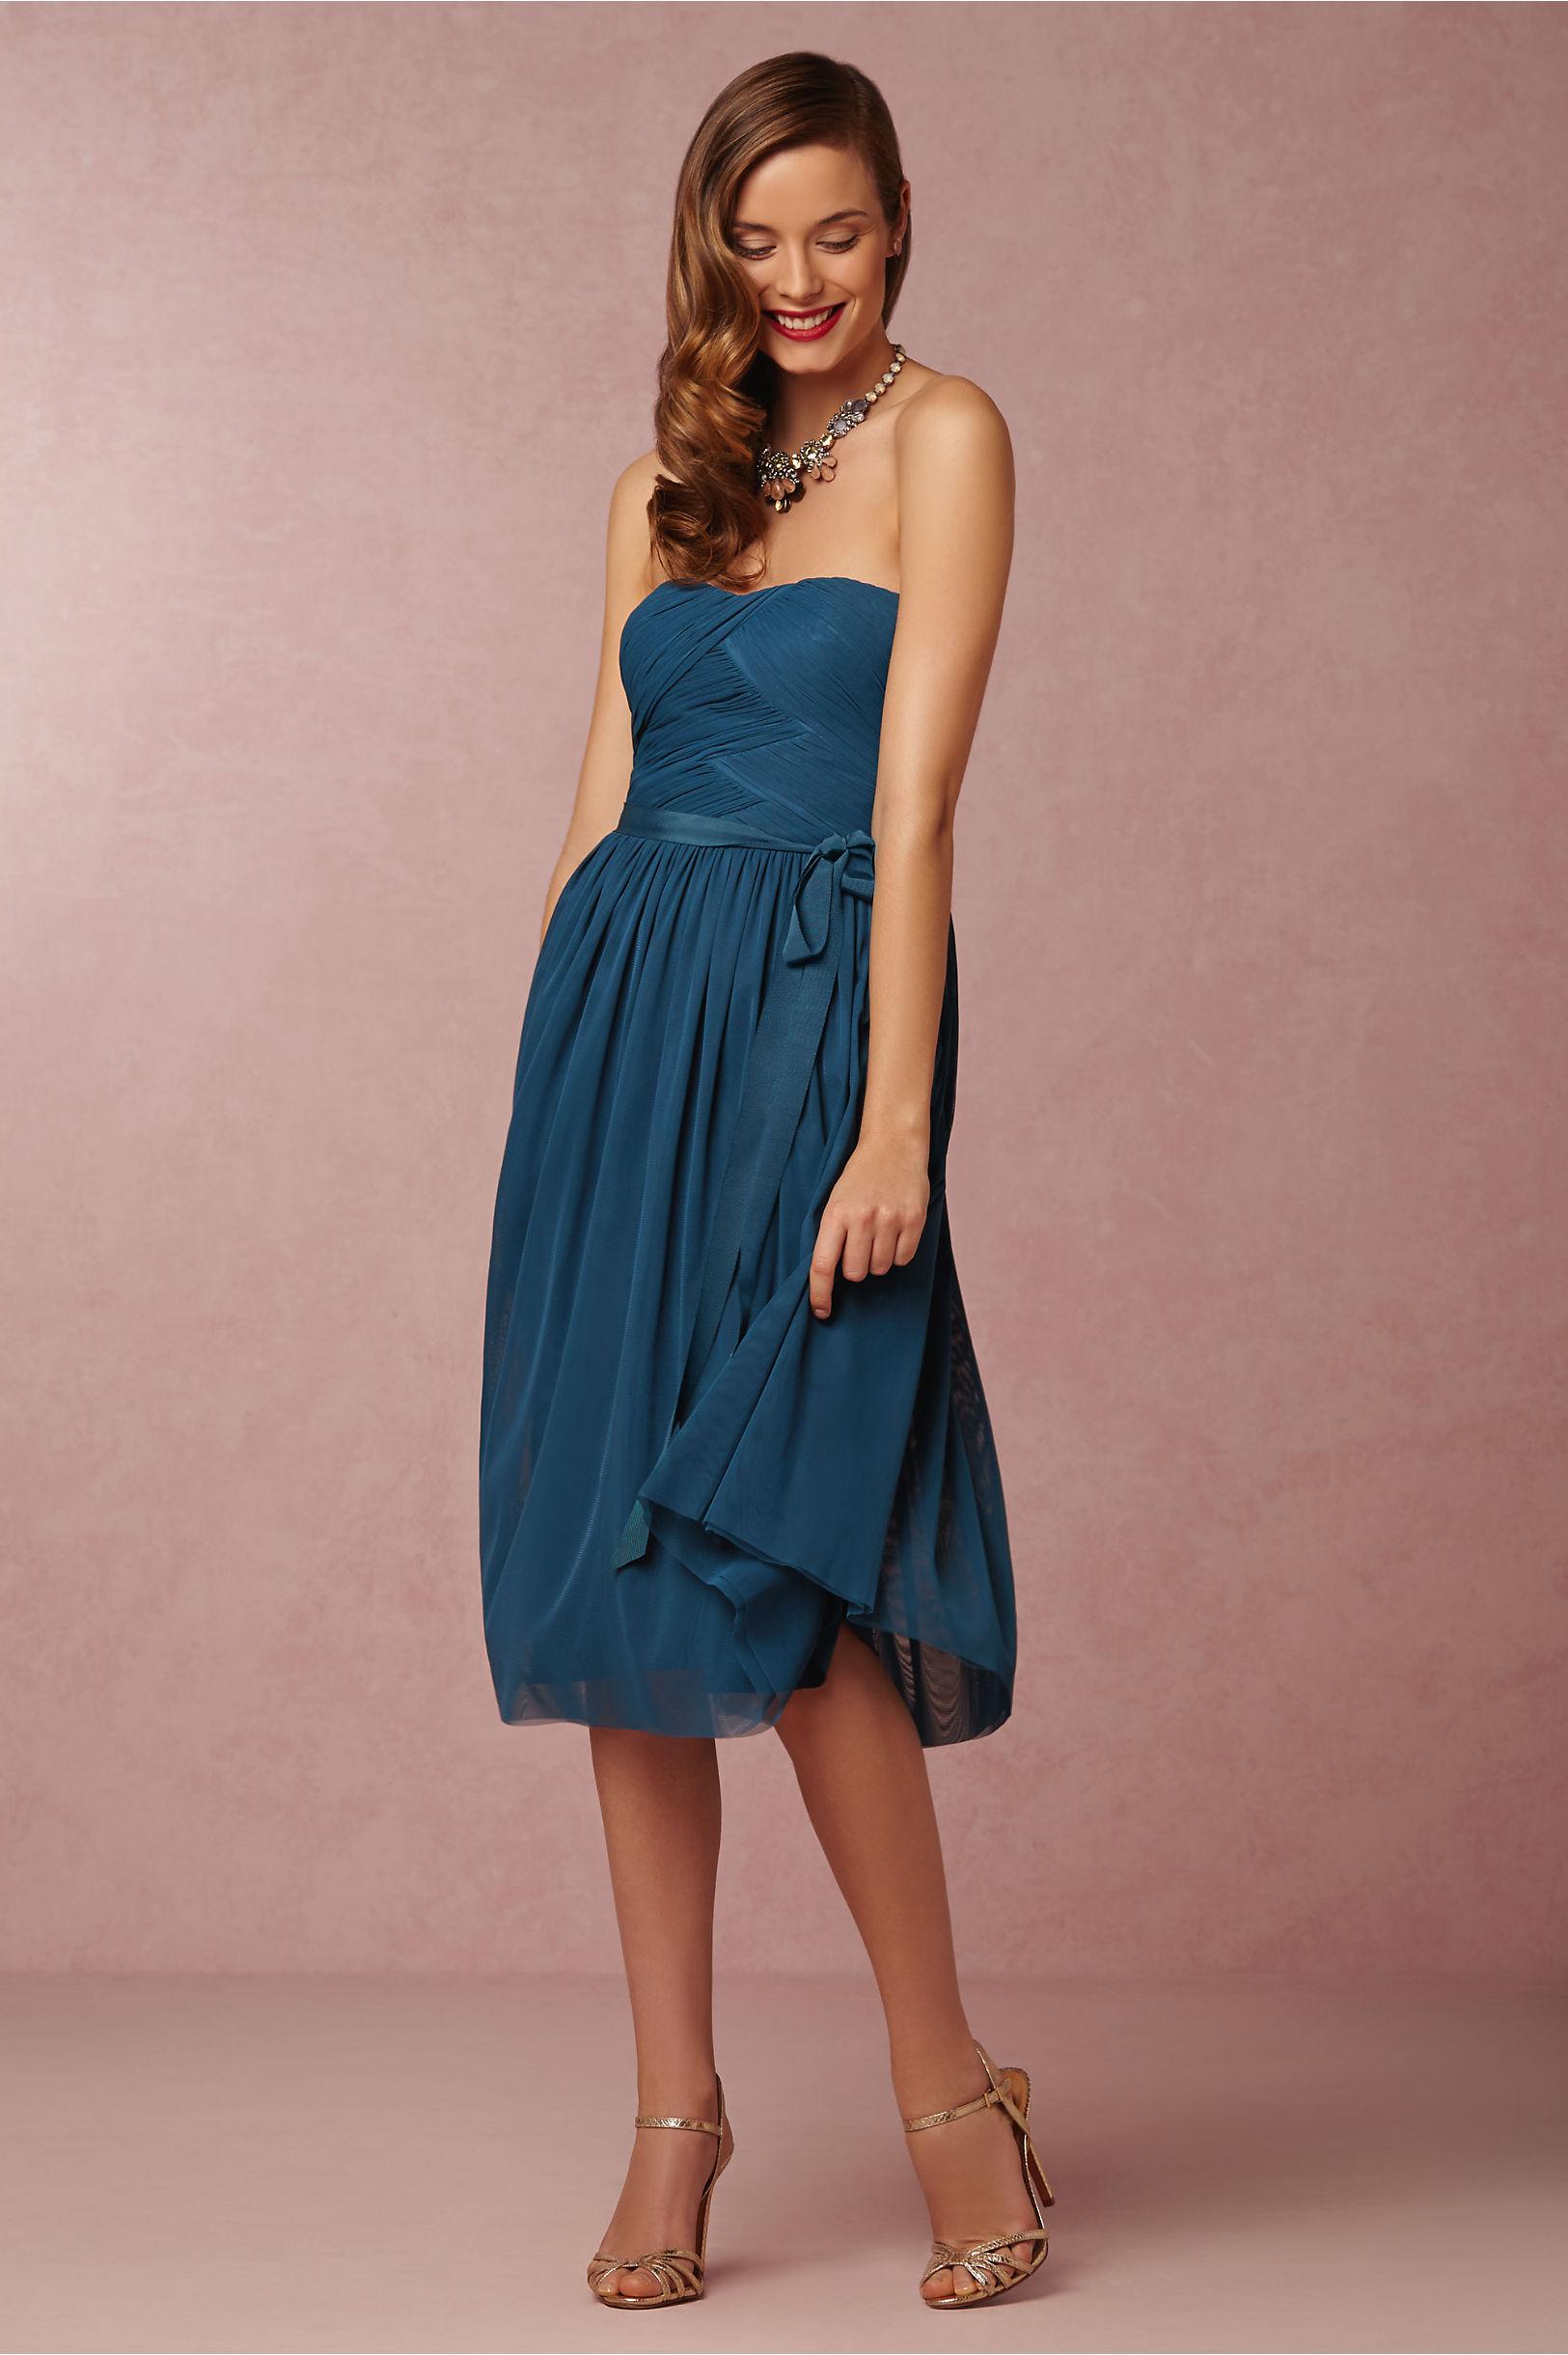 Cordelia Dress in Sale Dresses - BHLDN